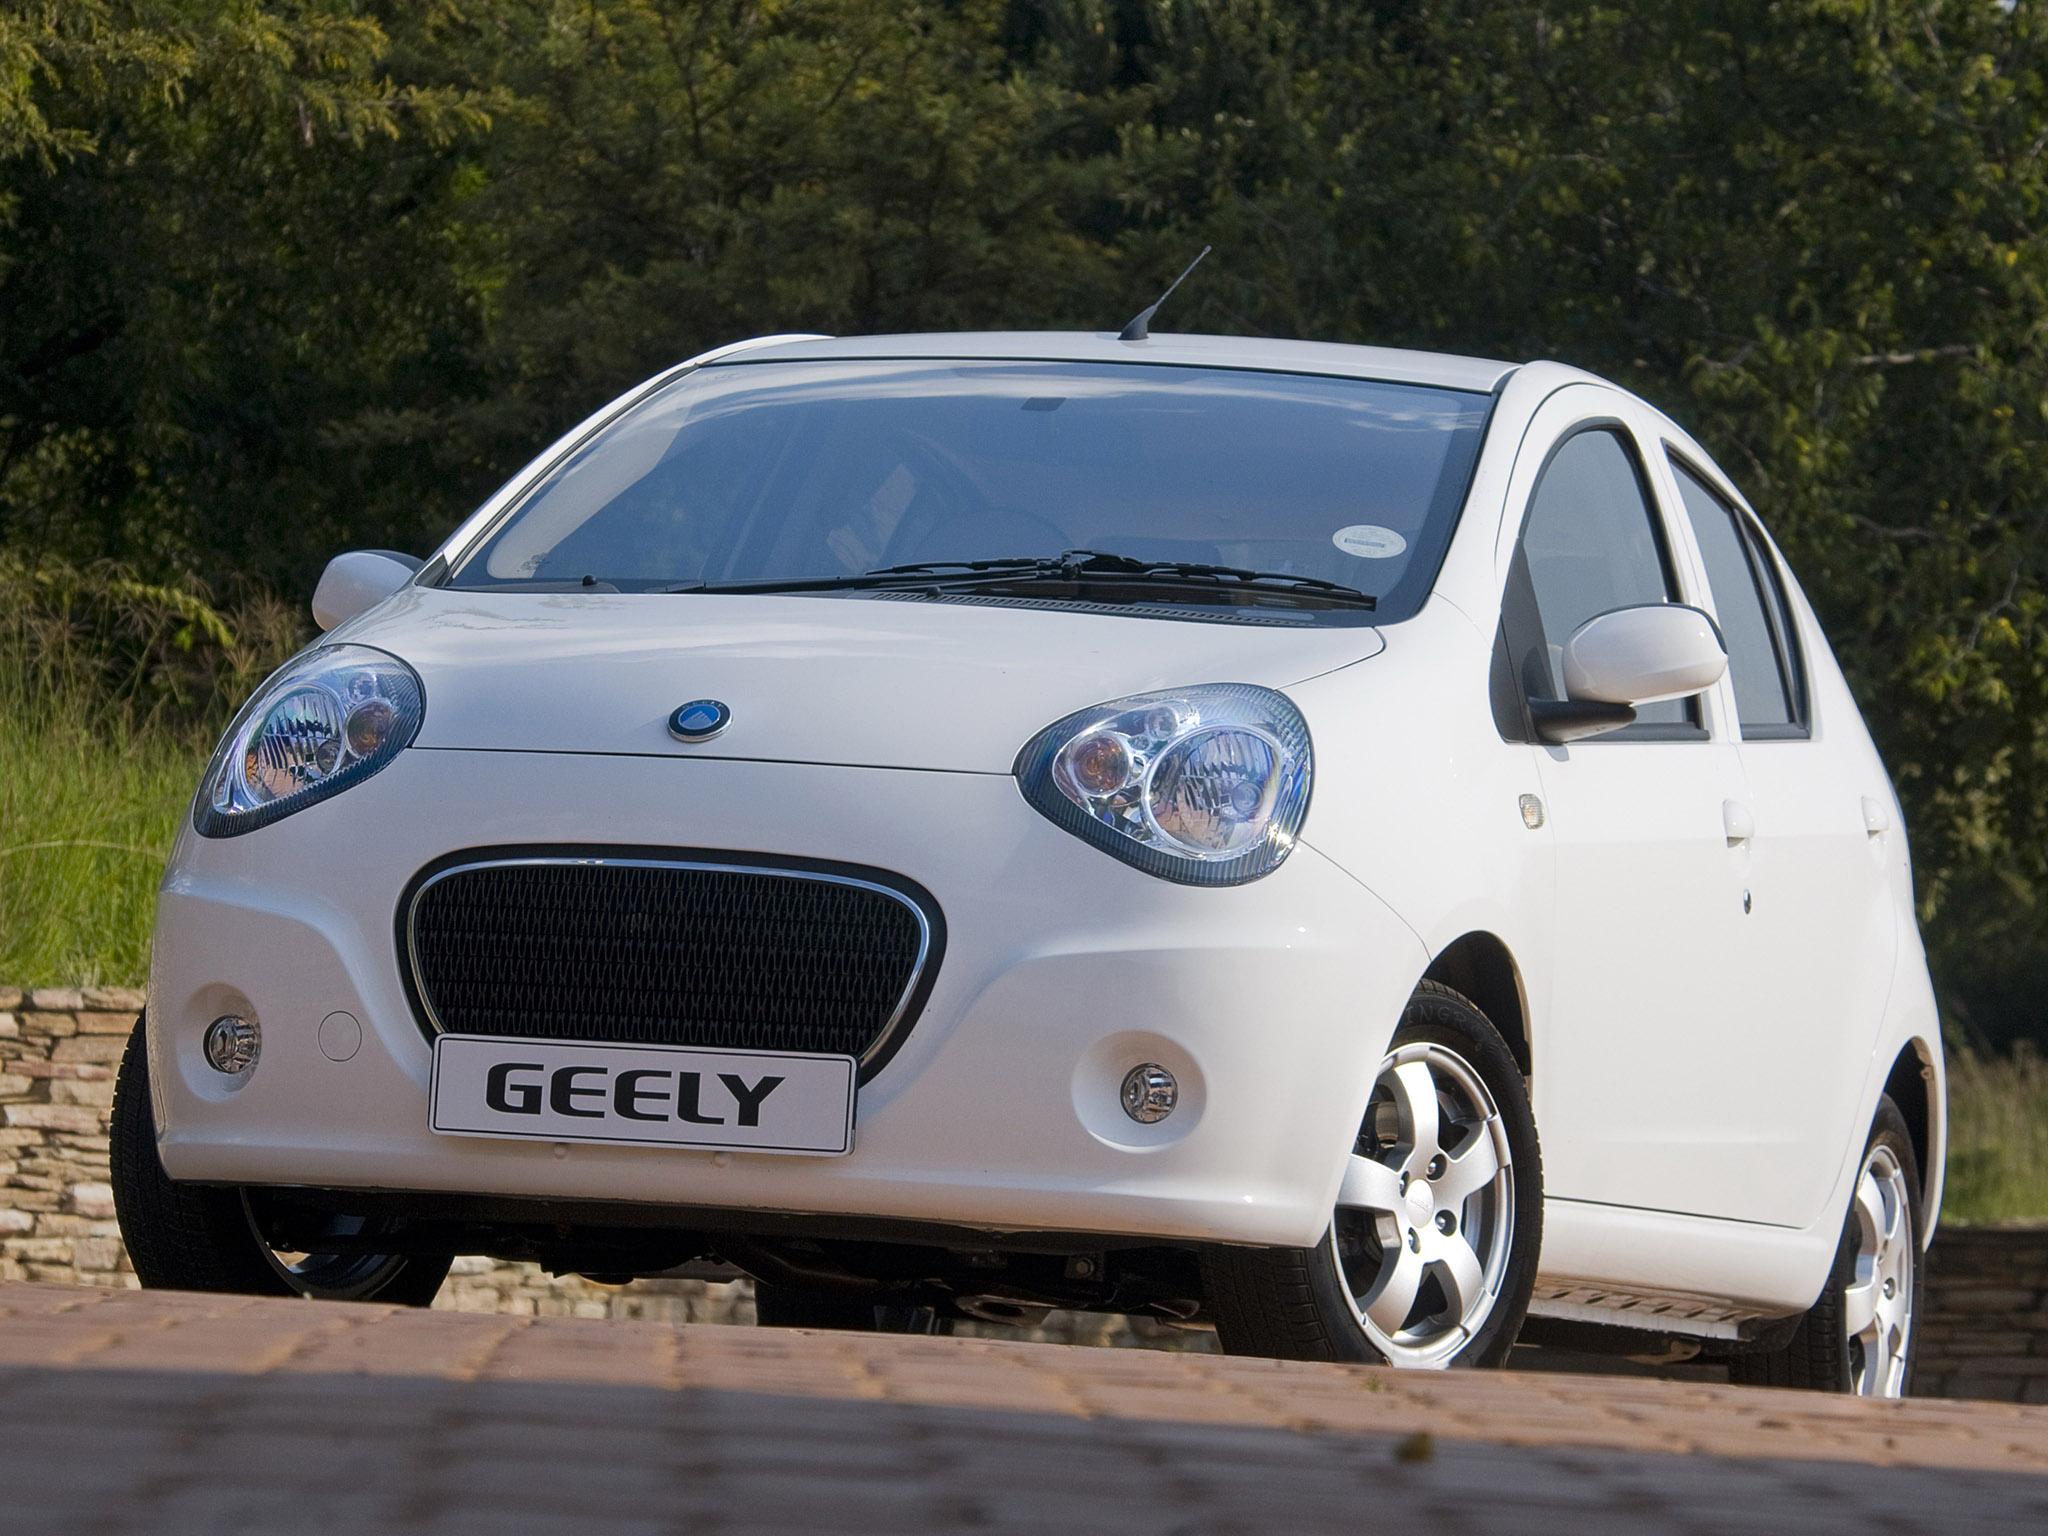 Wallpaper Convertible Netcarshow Netcar Car Images Car Photo